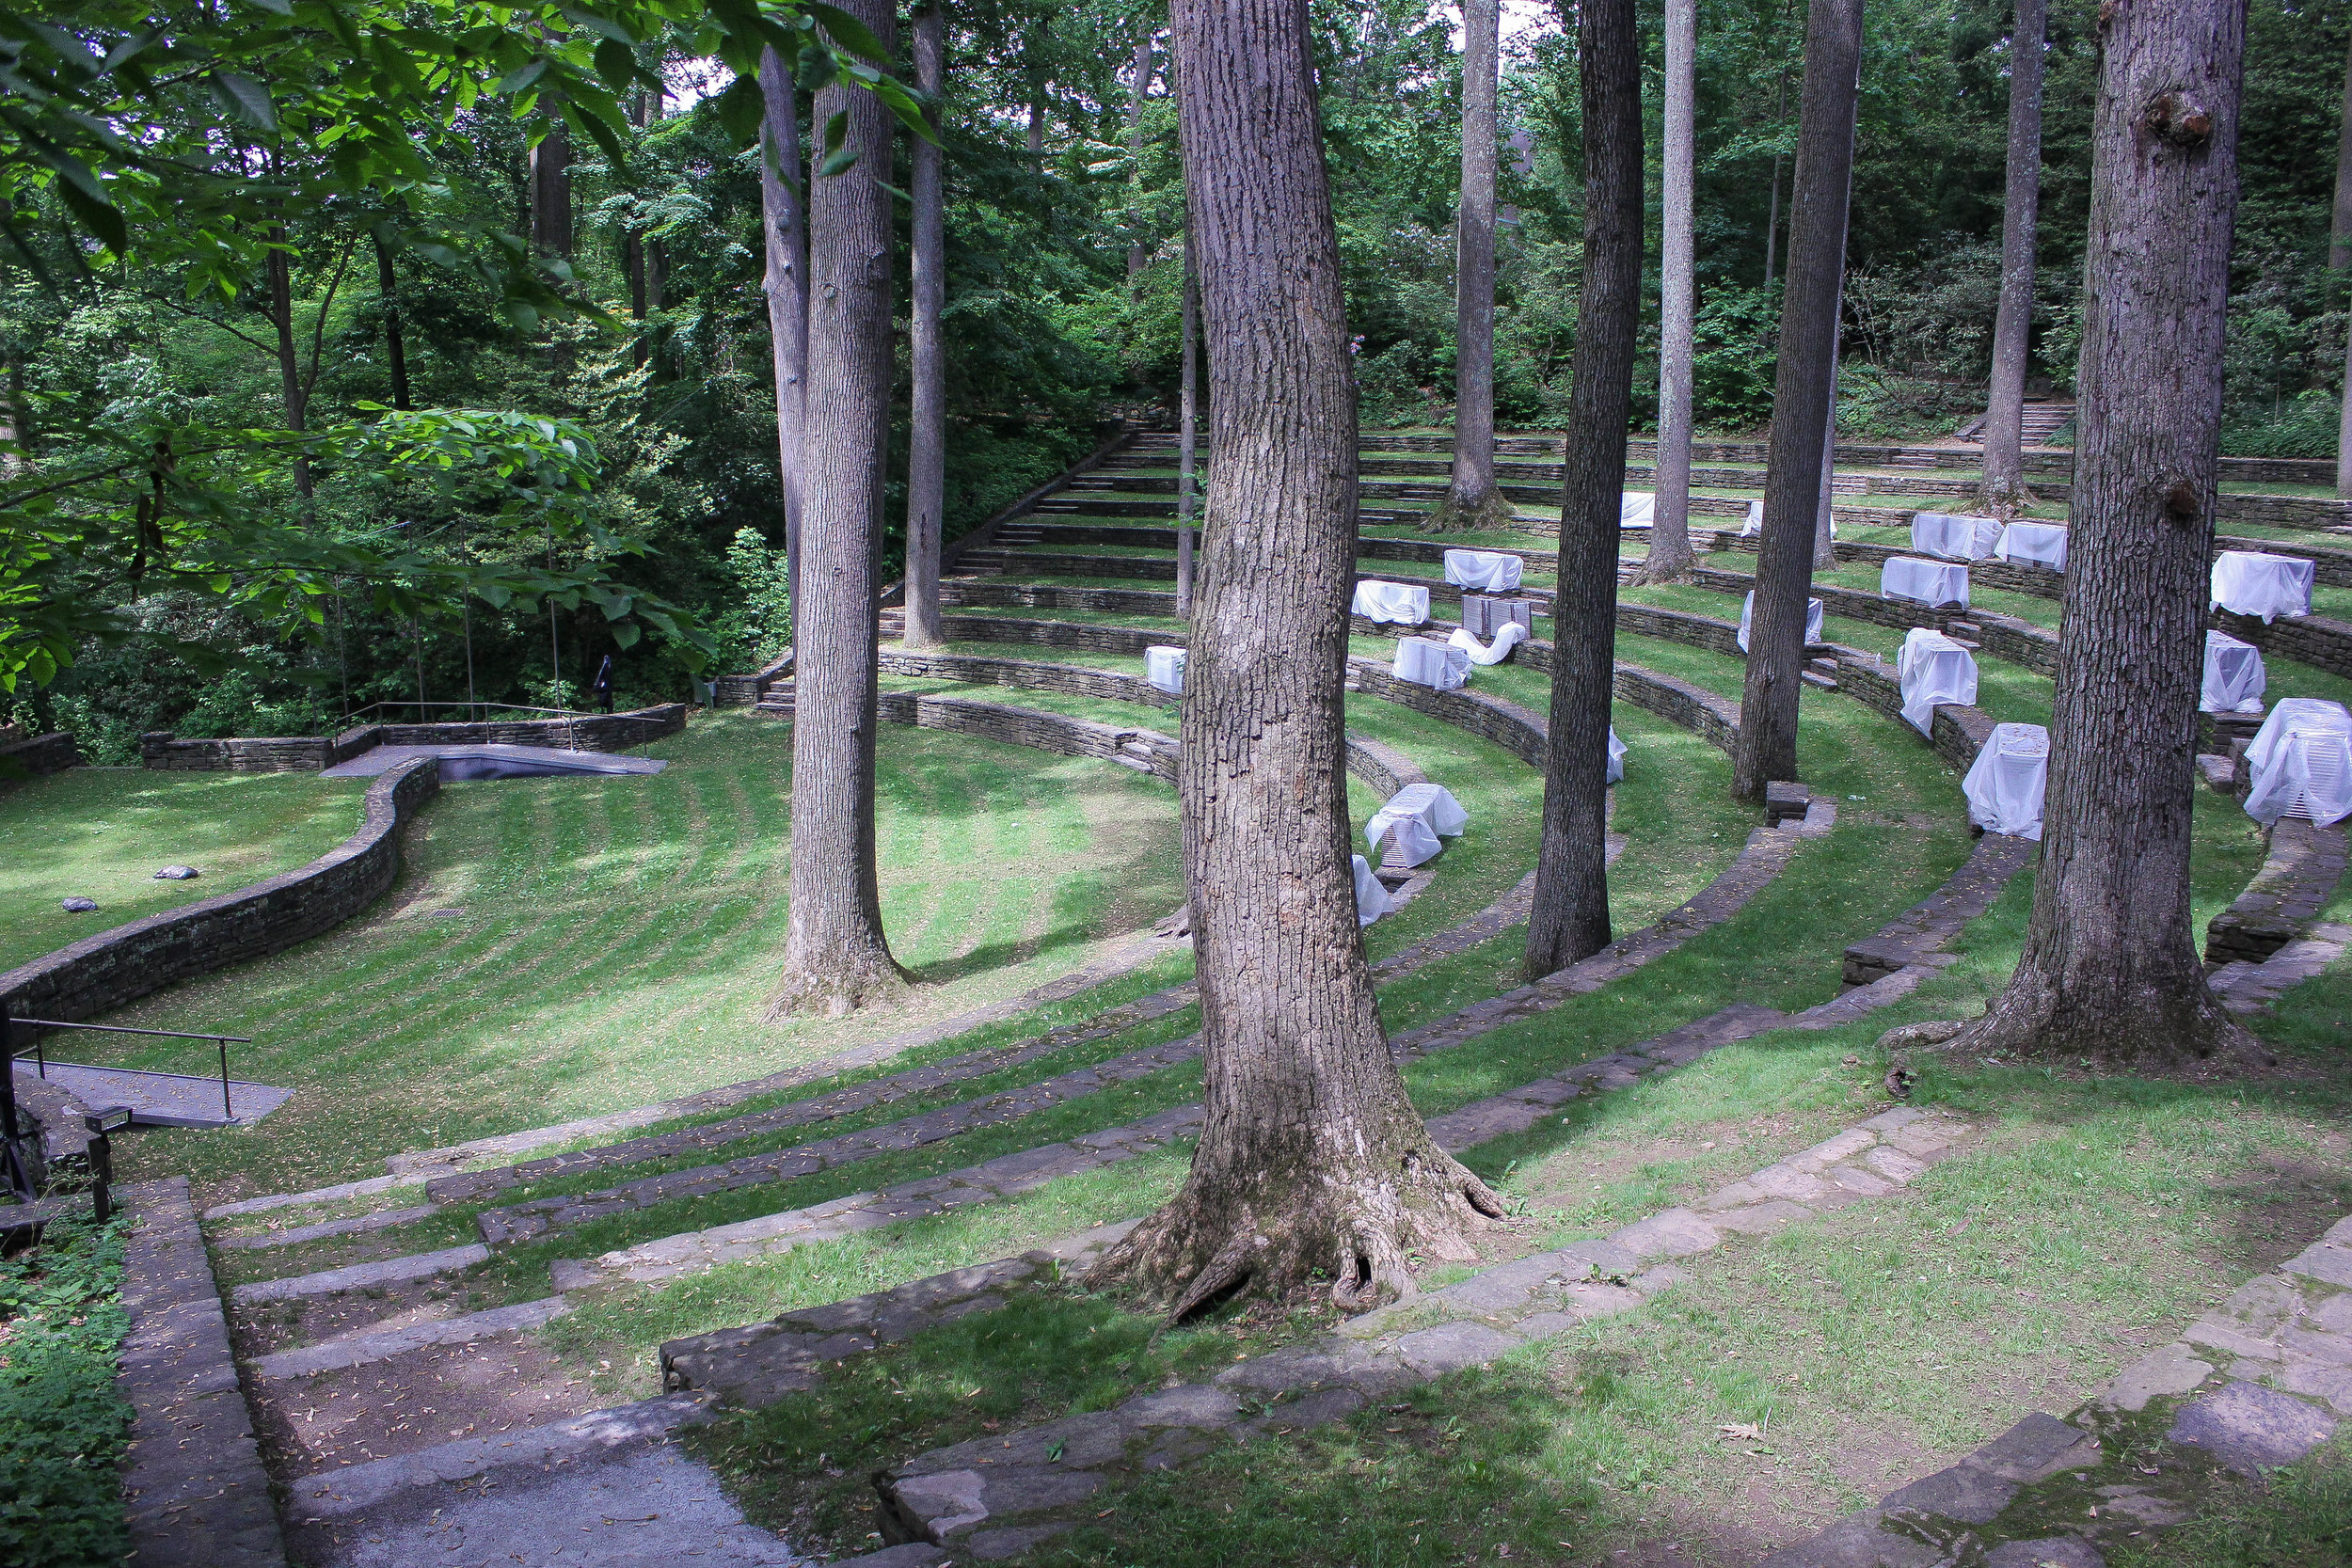 amphitheater 2-4016.jpg